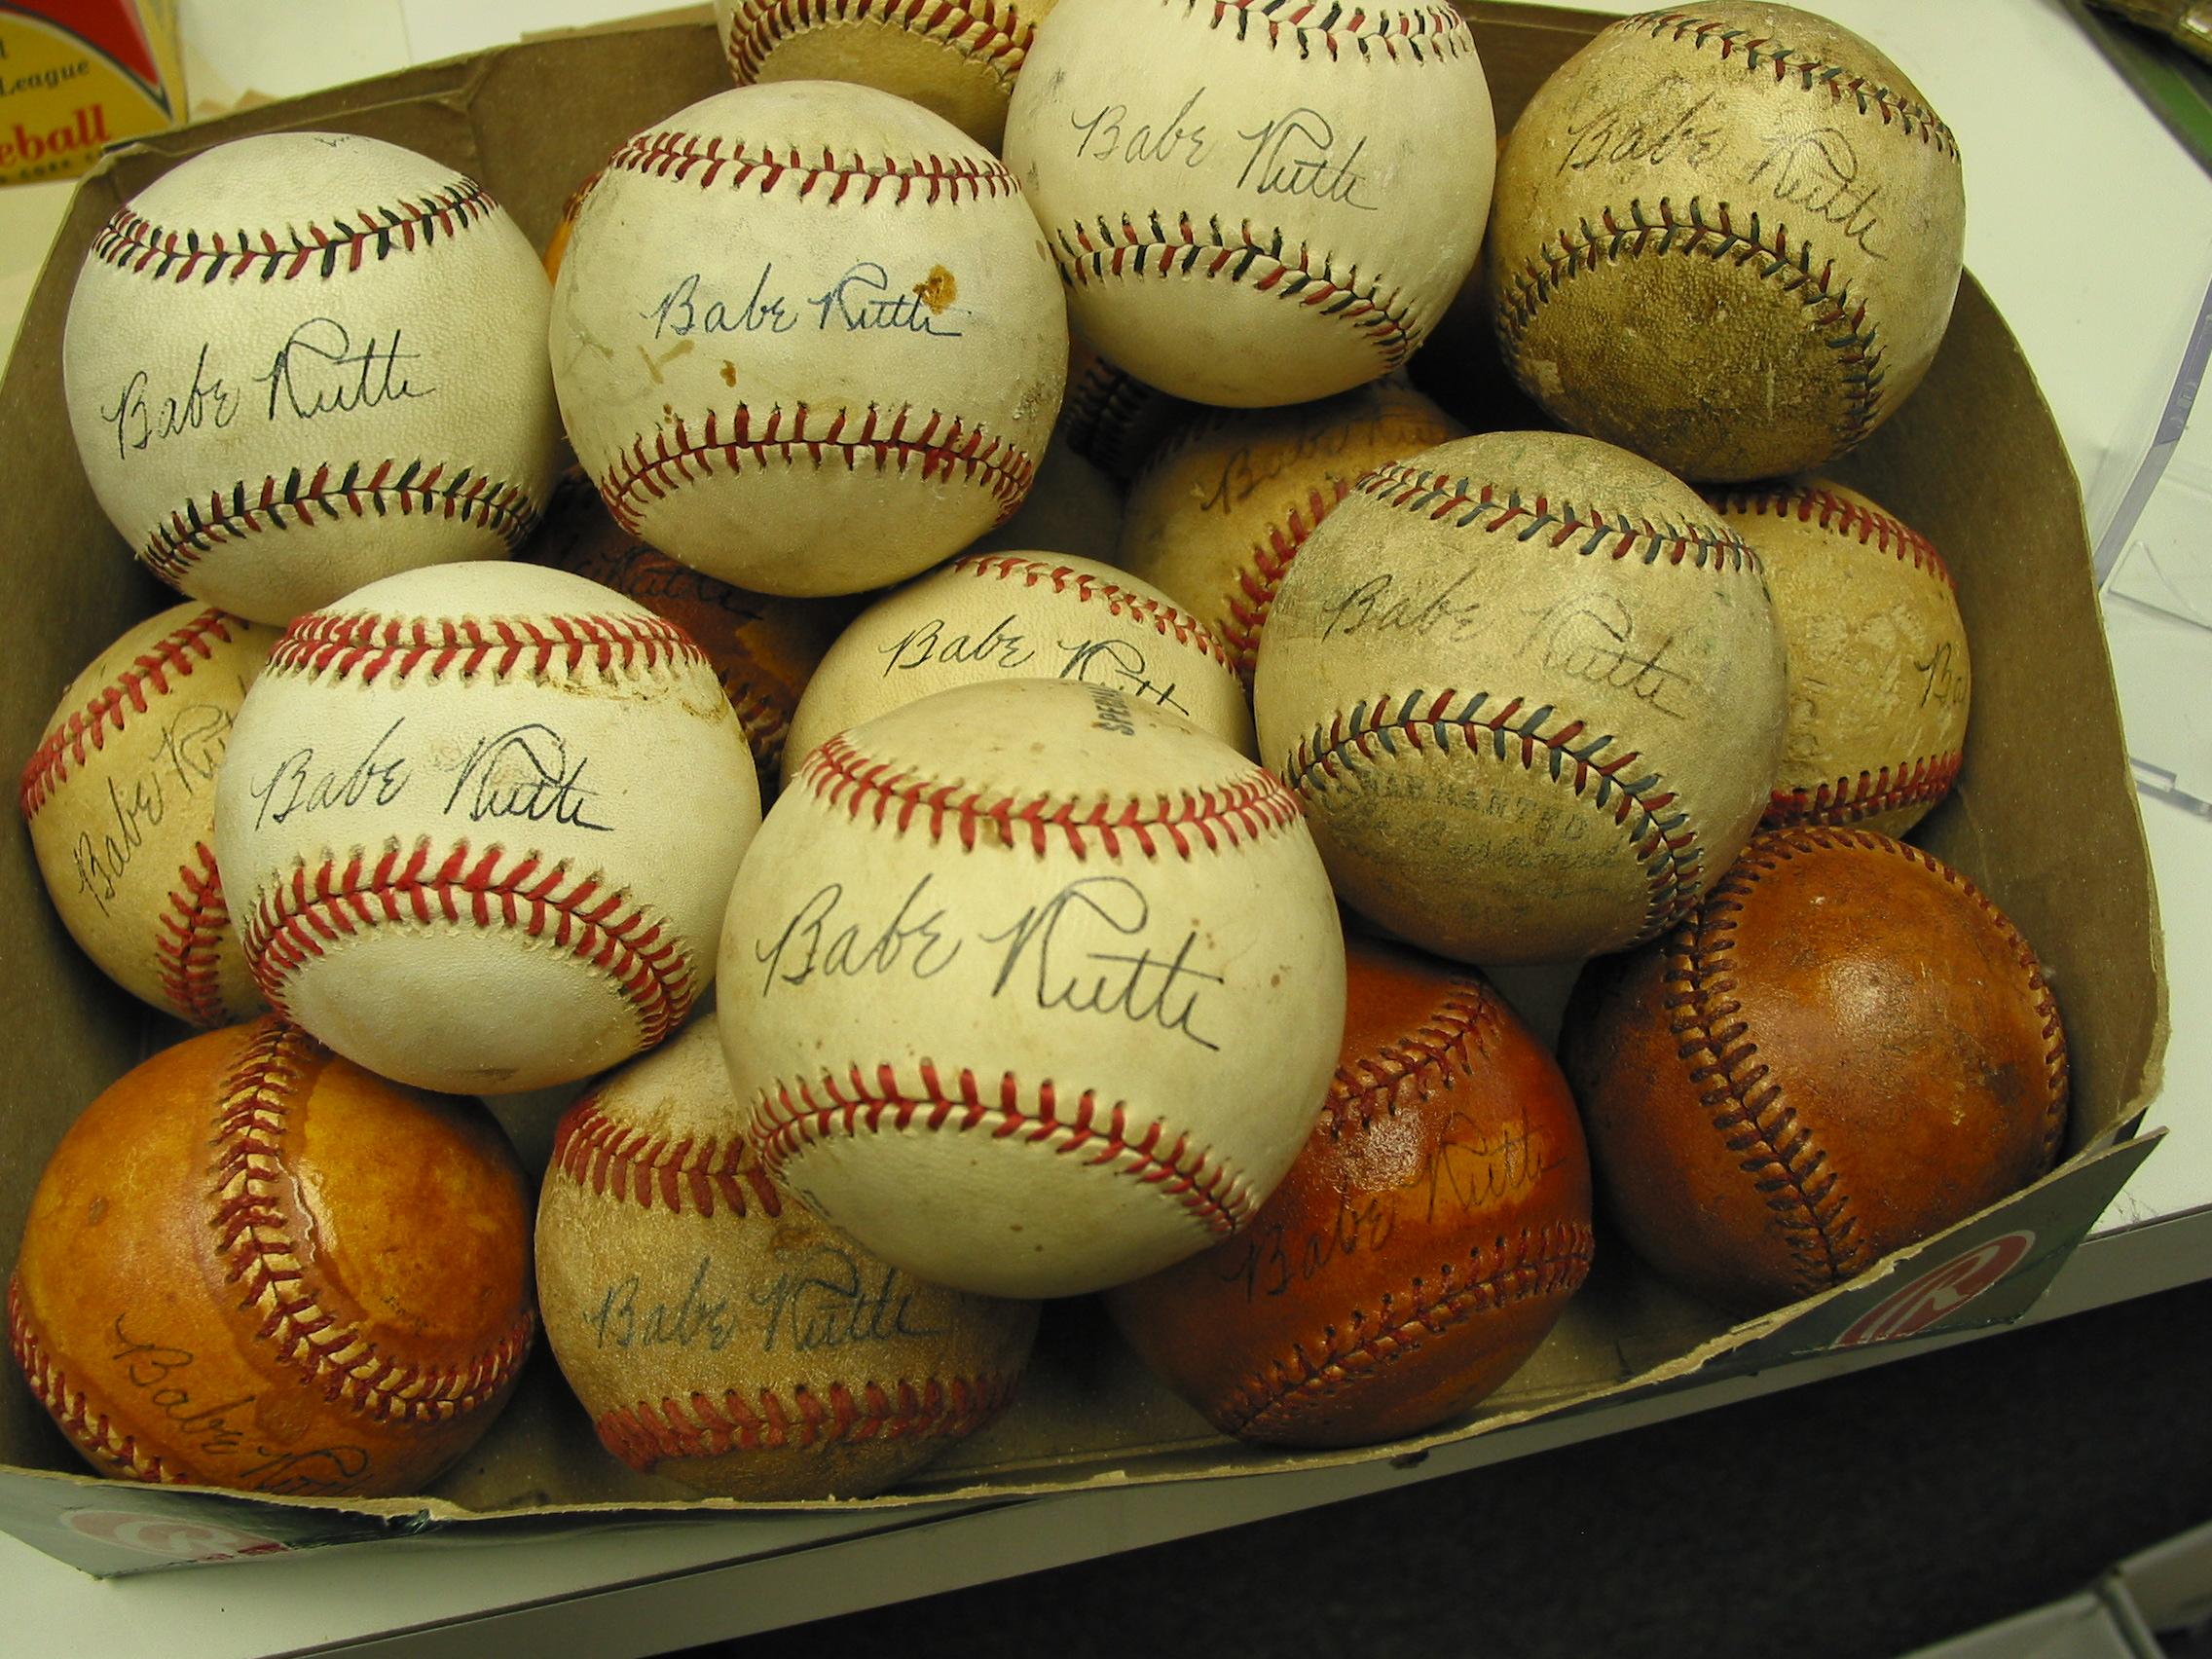 Fake Ruth baseballs